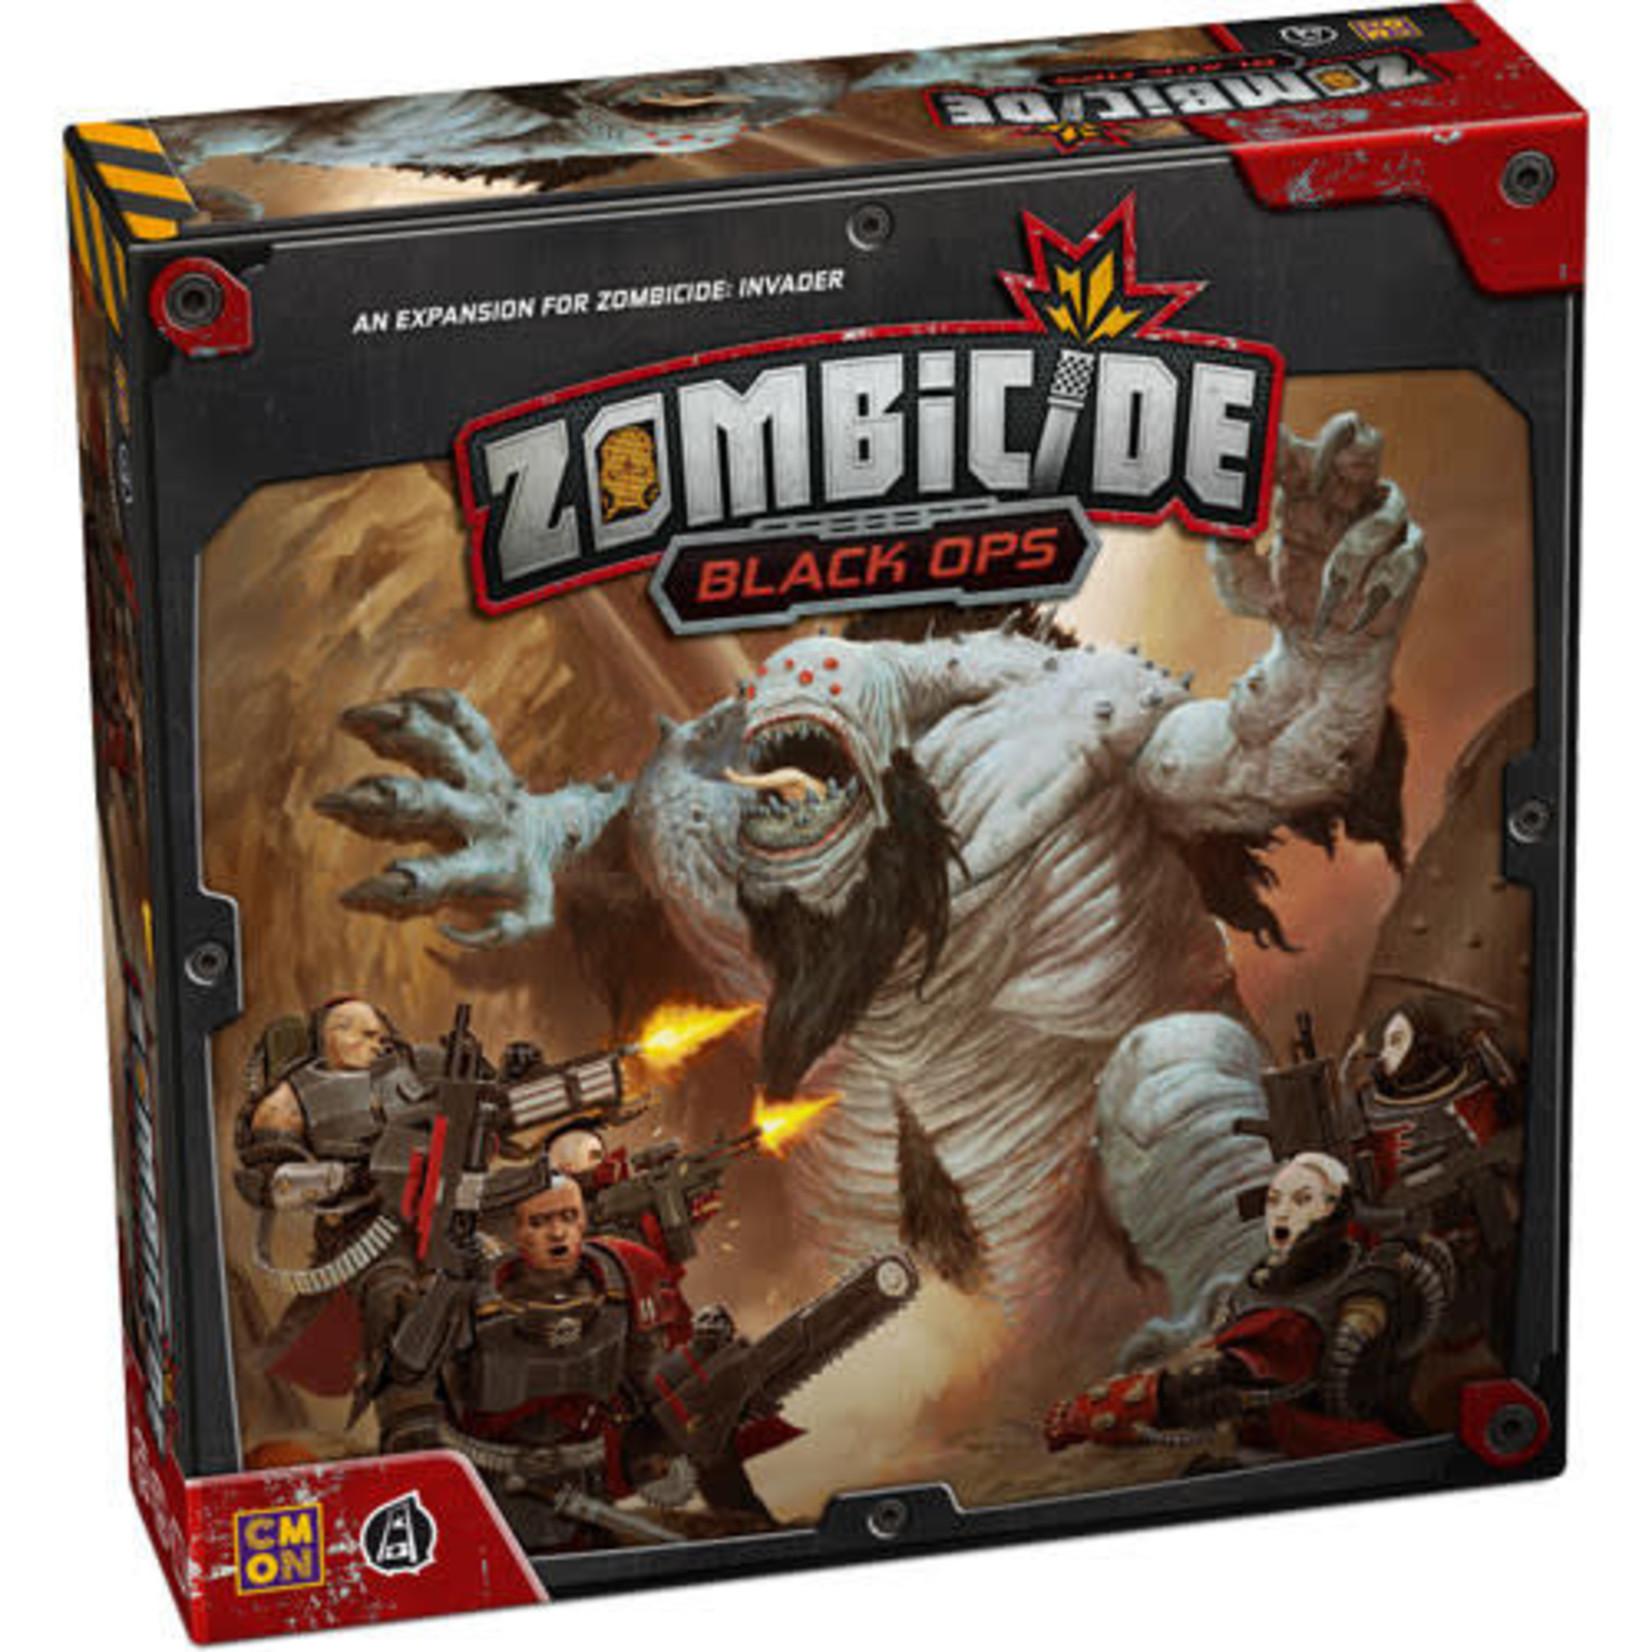 CMON Zombicide Invader: Black Ops (Kickstarter edition)